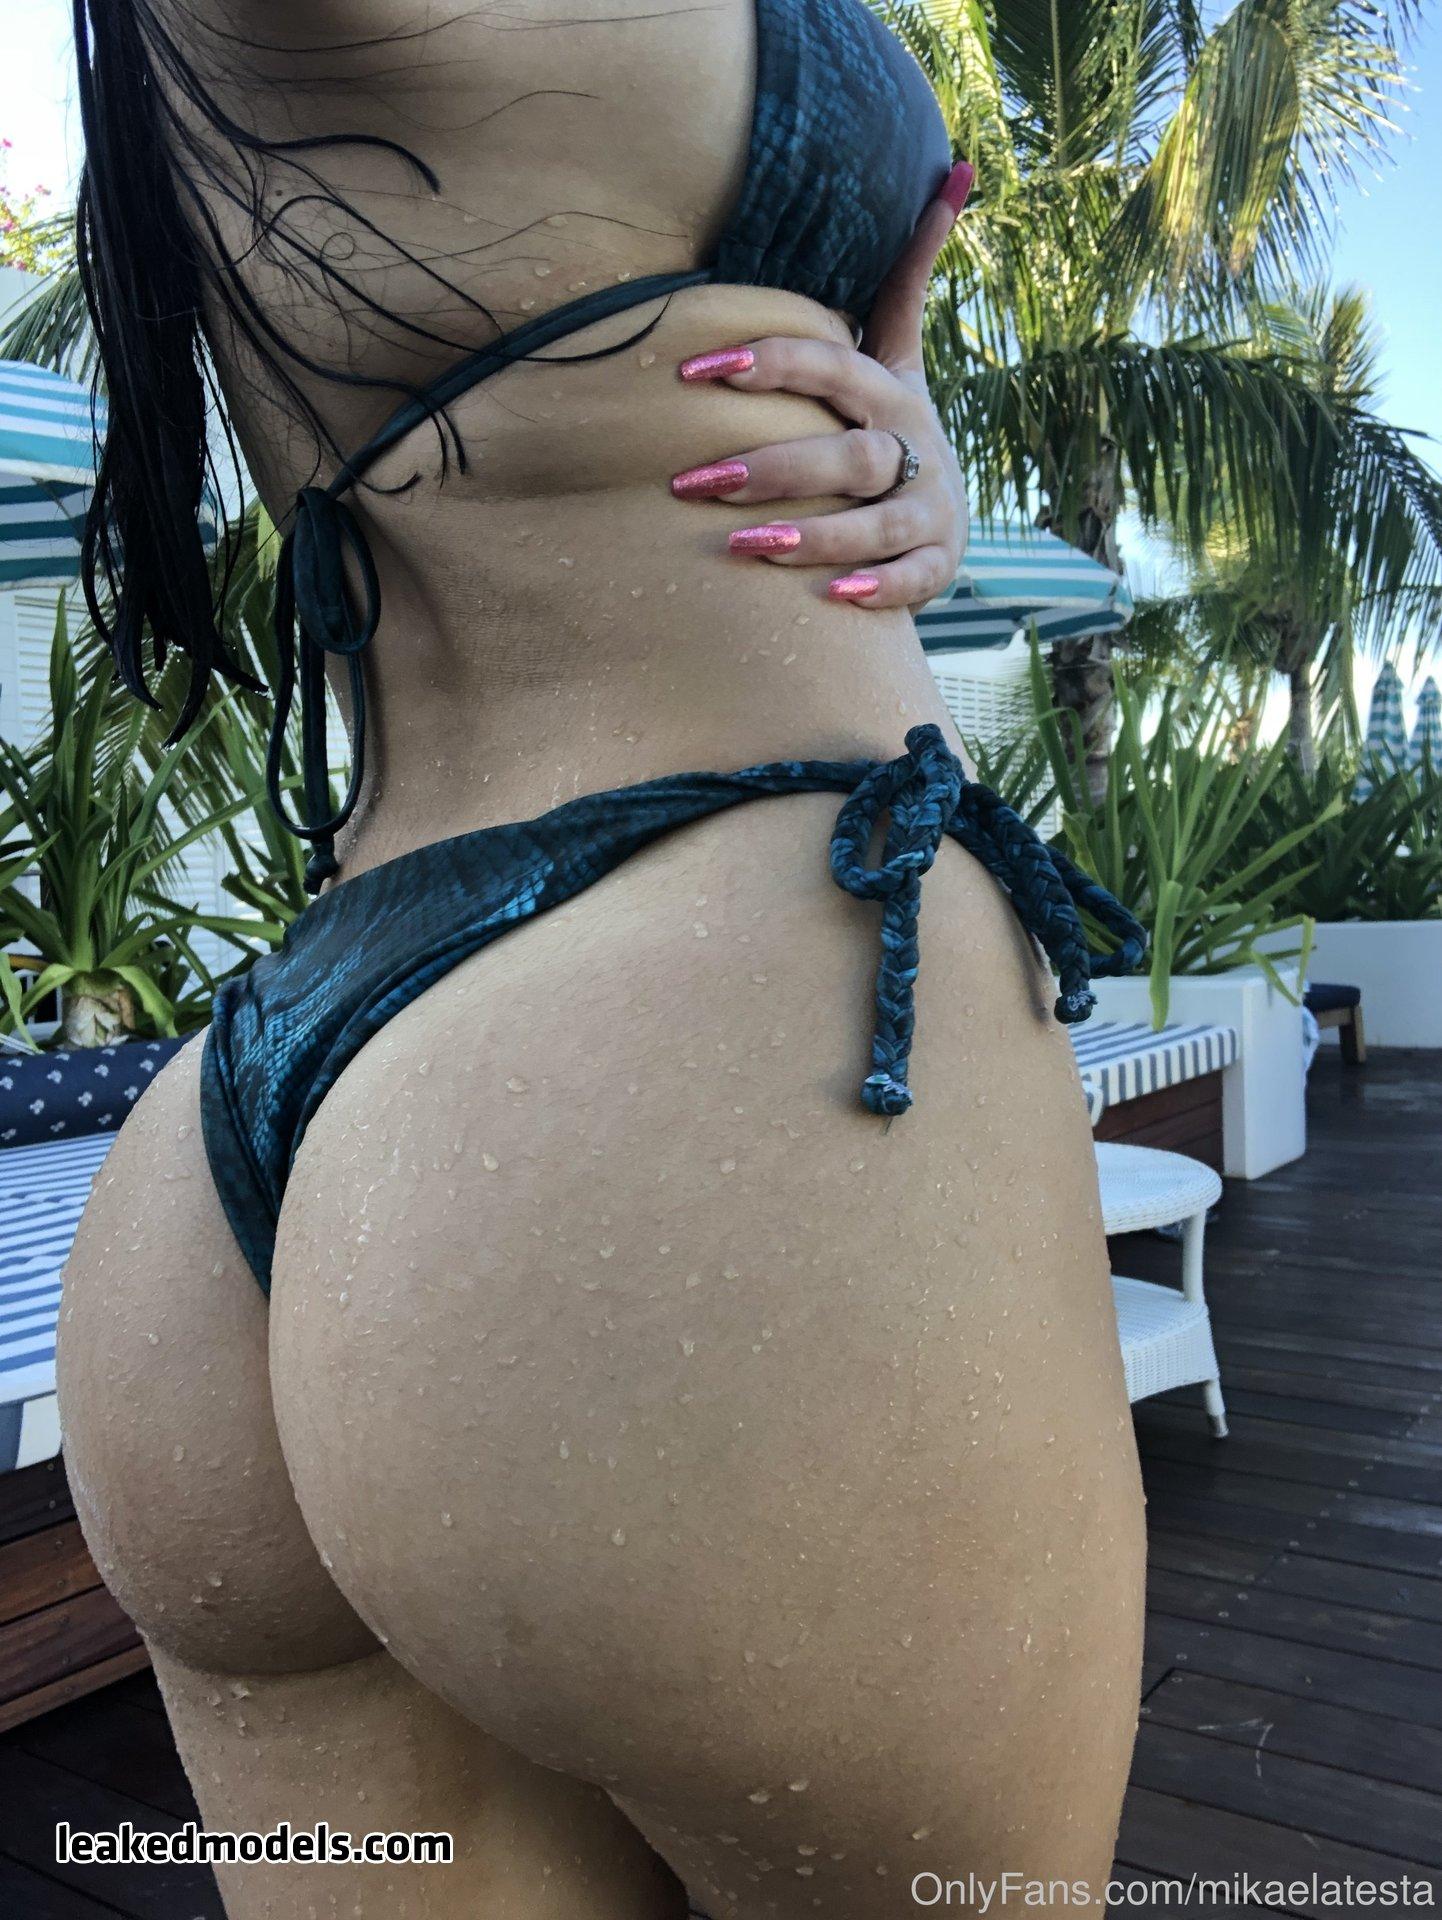 Mik X – mikealatesta OnlyFans Nude Leaks (33 Photos)